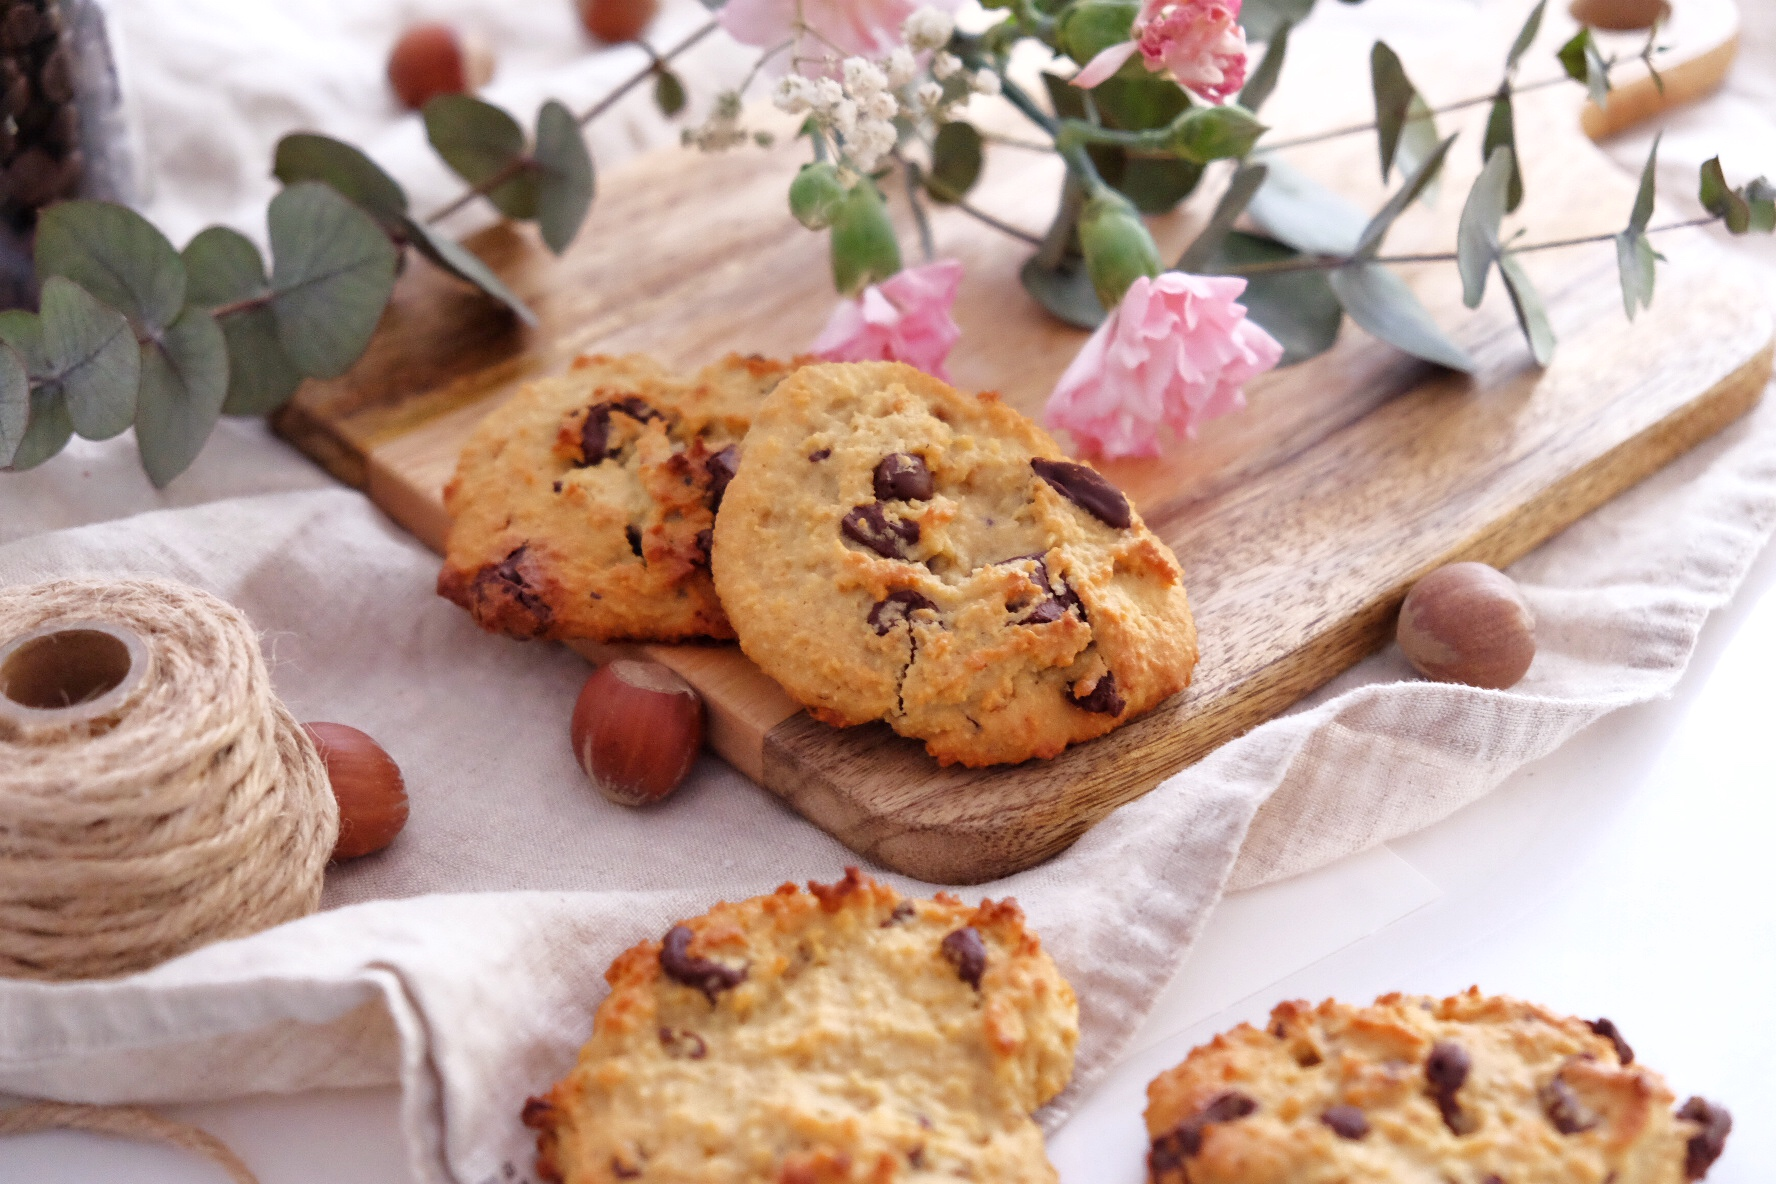 Delicious gluten free cookies.